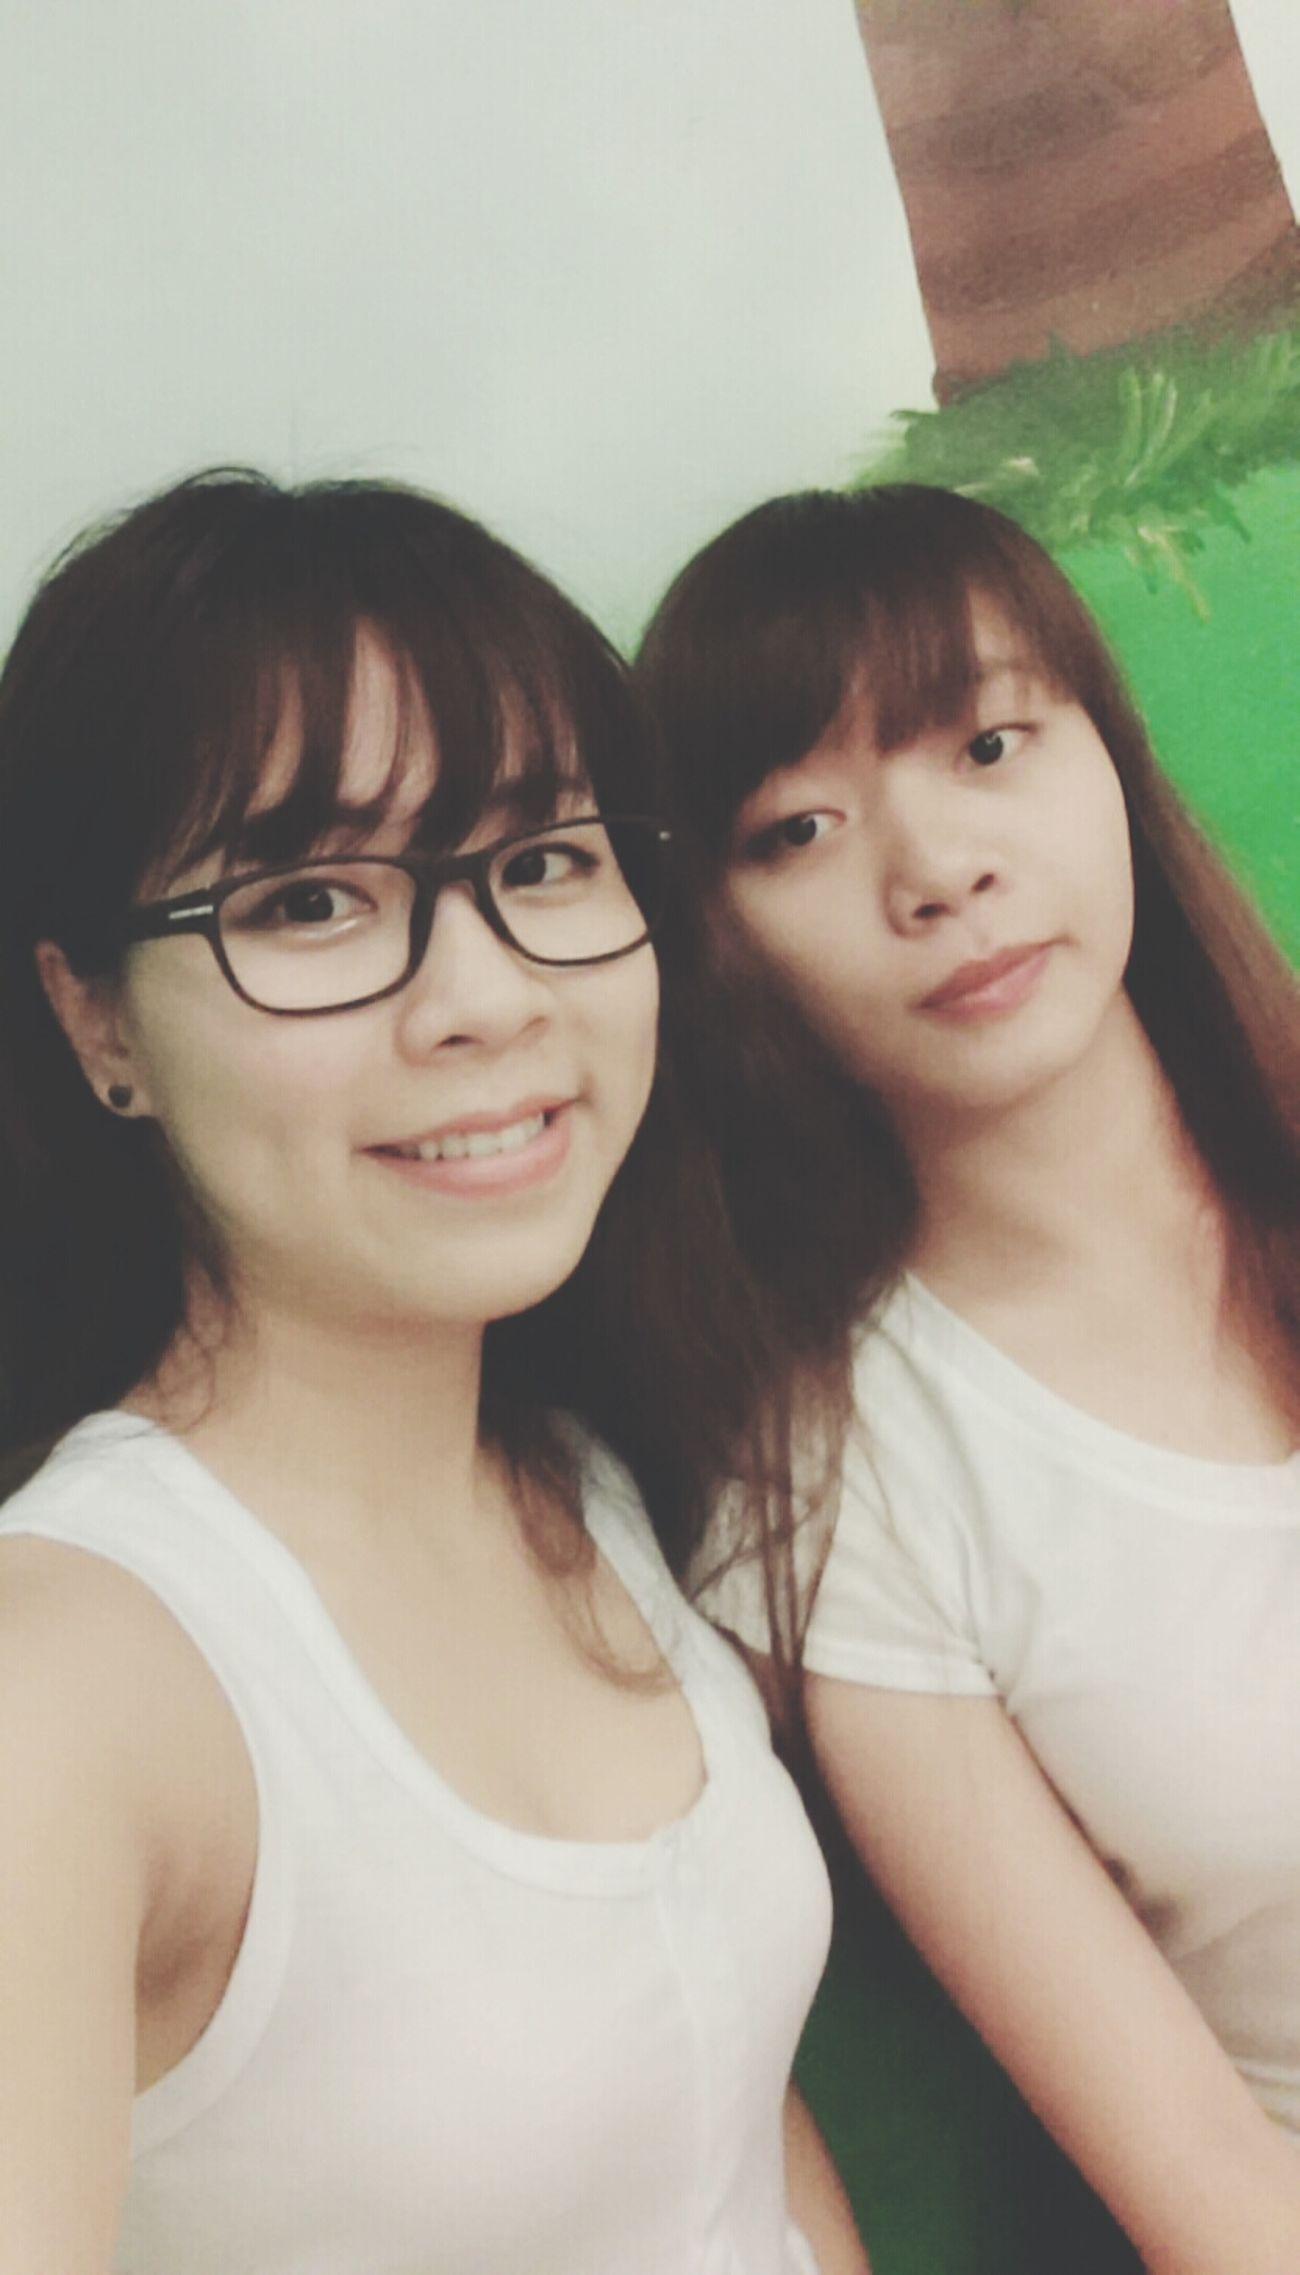 Asian Girl Saigongirl Stupid Girl lol